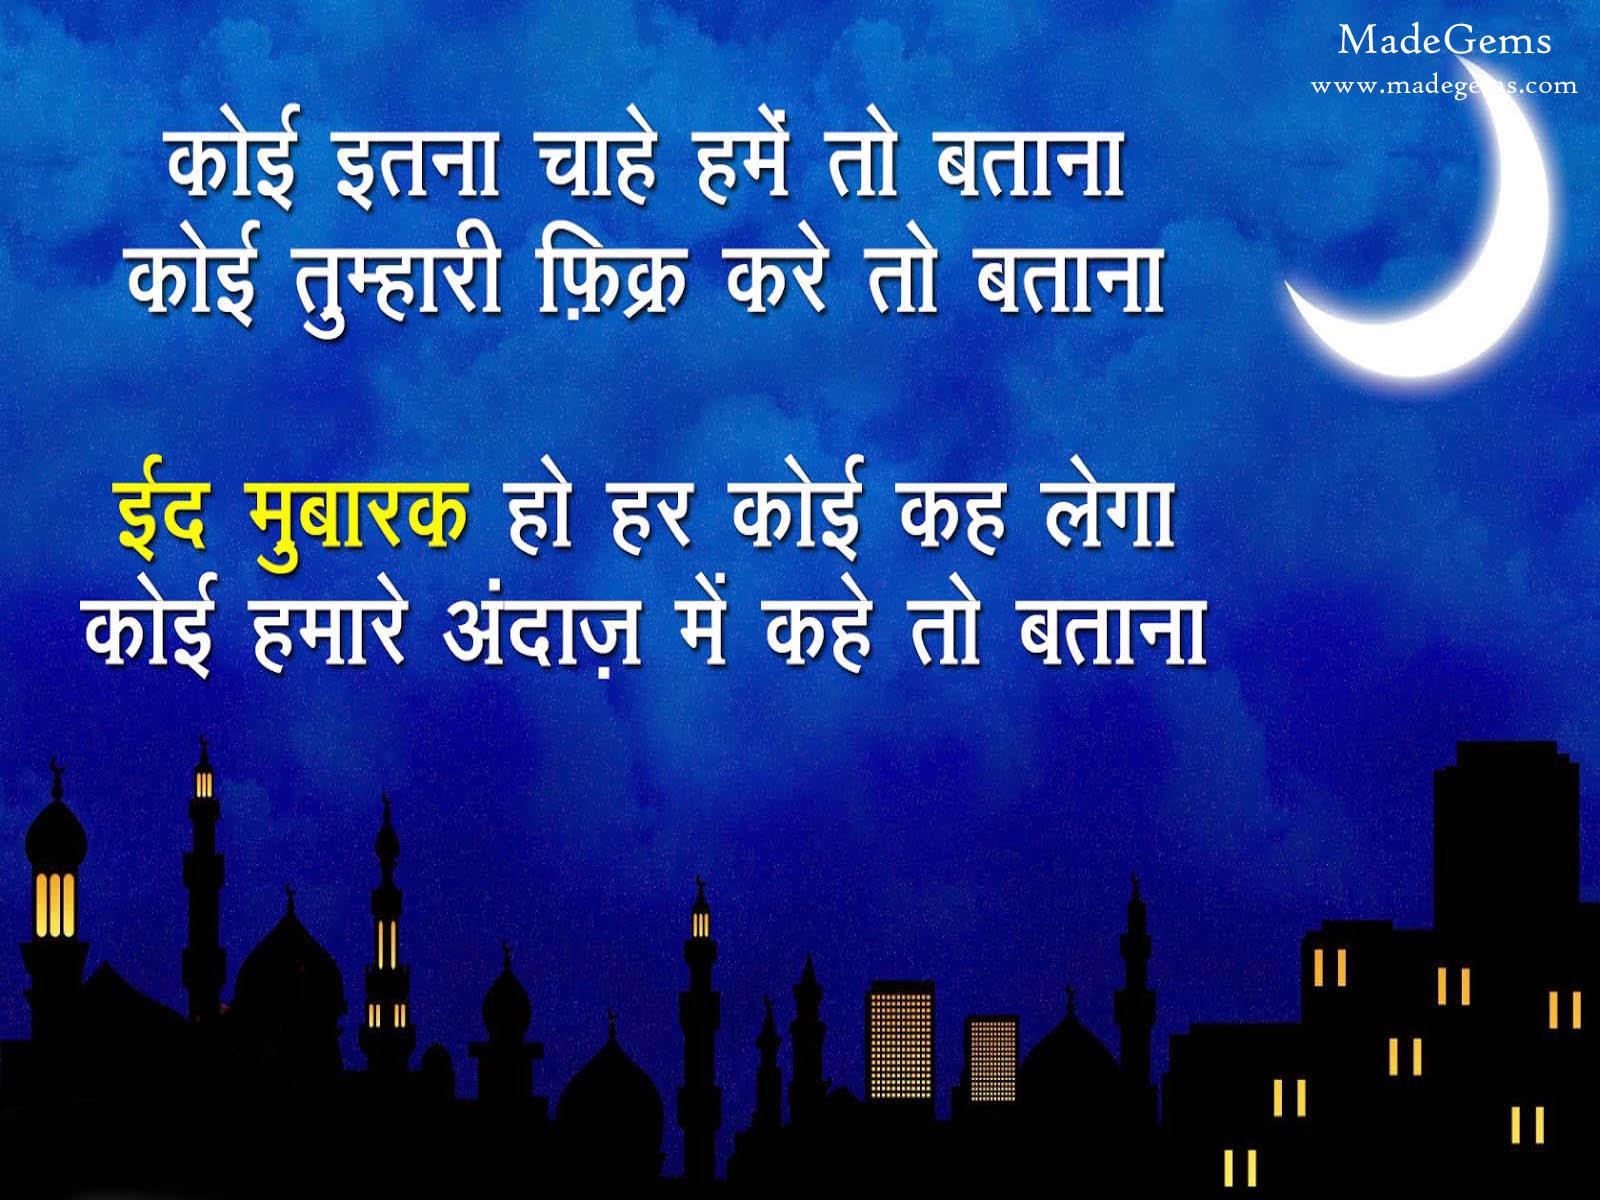 Eid Mubarak Shayari Hd Wallpaper Pictures 1600x1200 Download Hd Wallpaper Wallpapertip